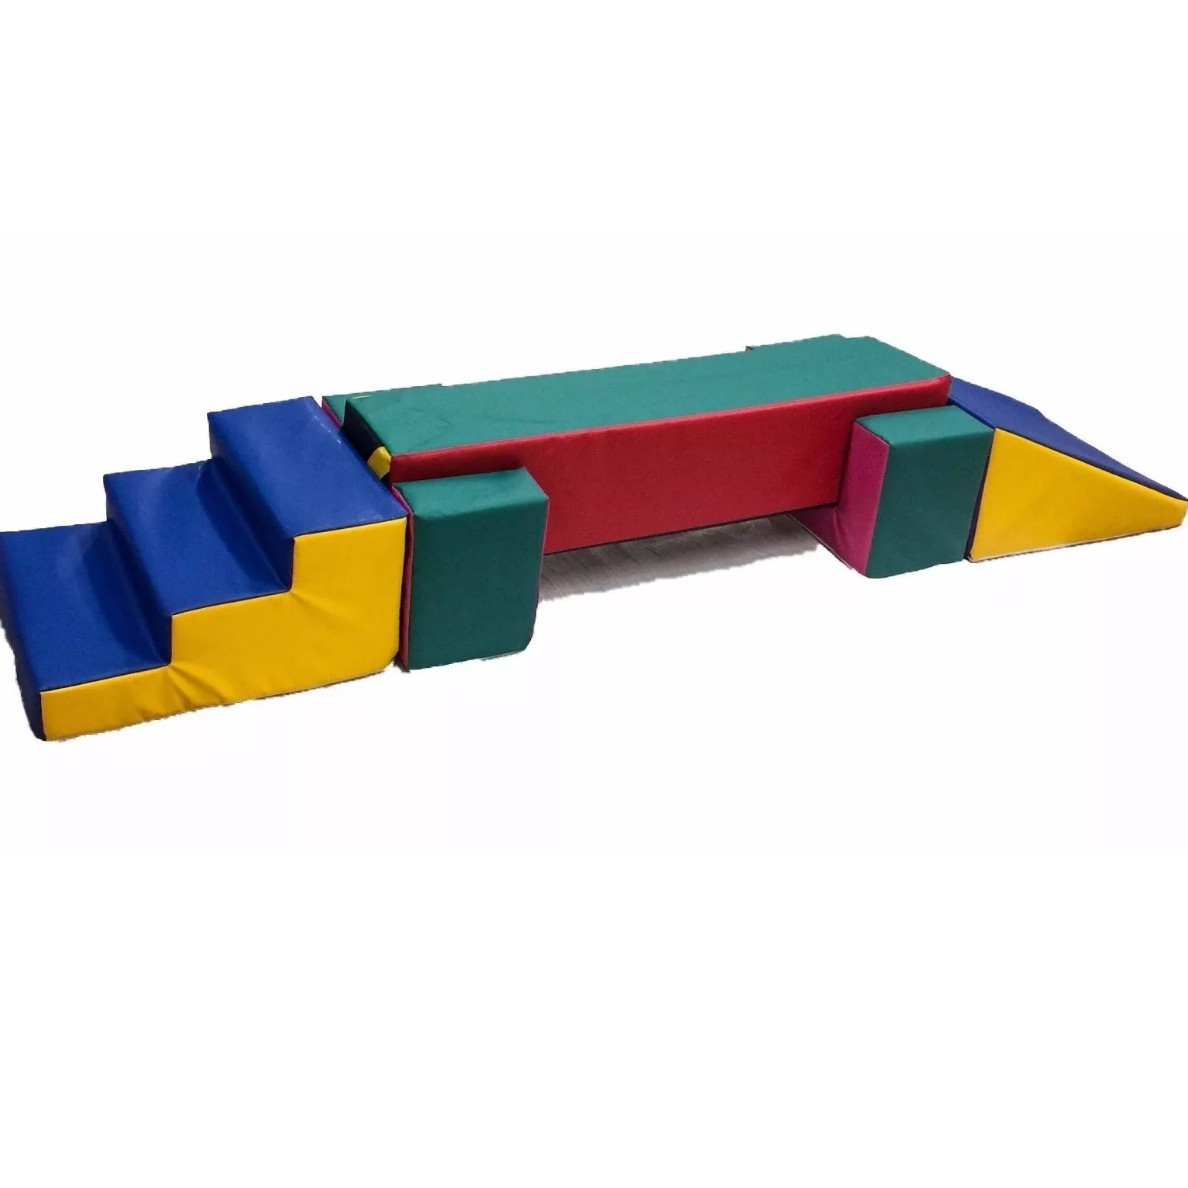 Softplay toys4kids ltd